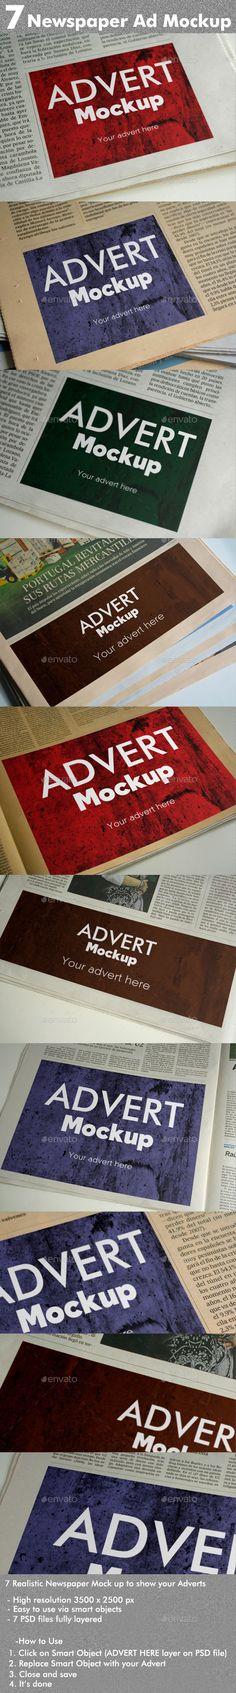 7 Newspaper Ad Mockups